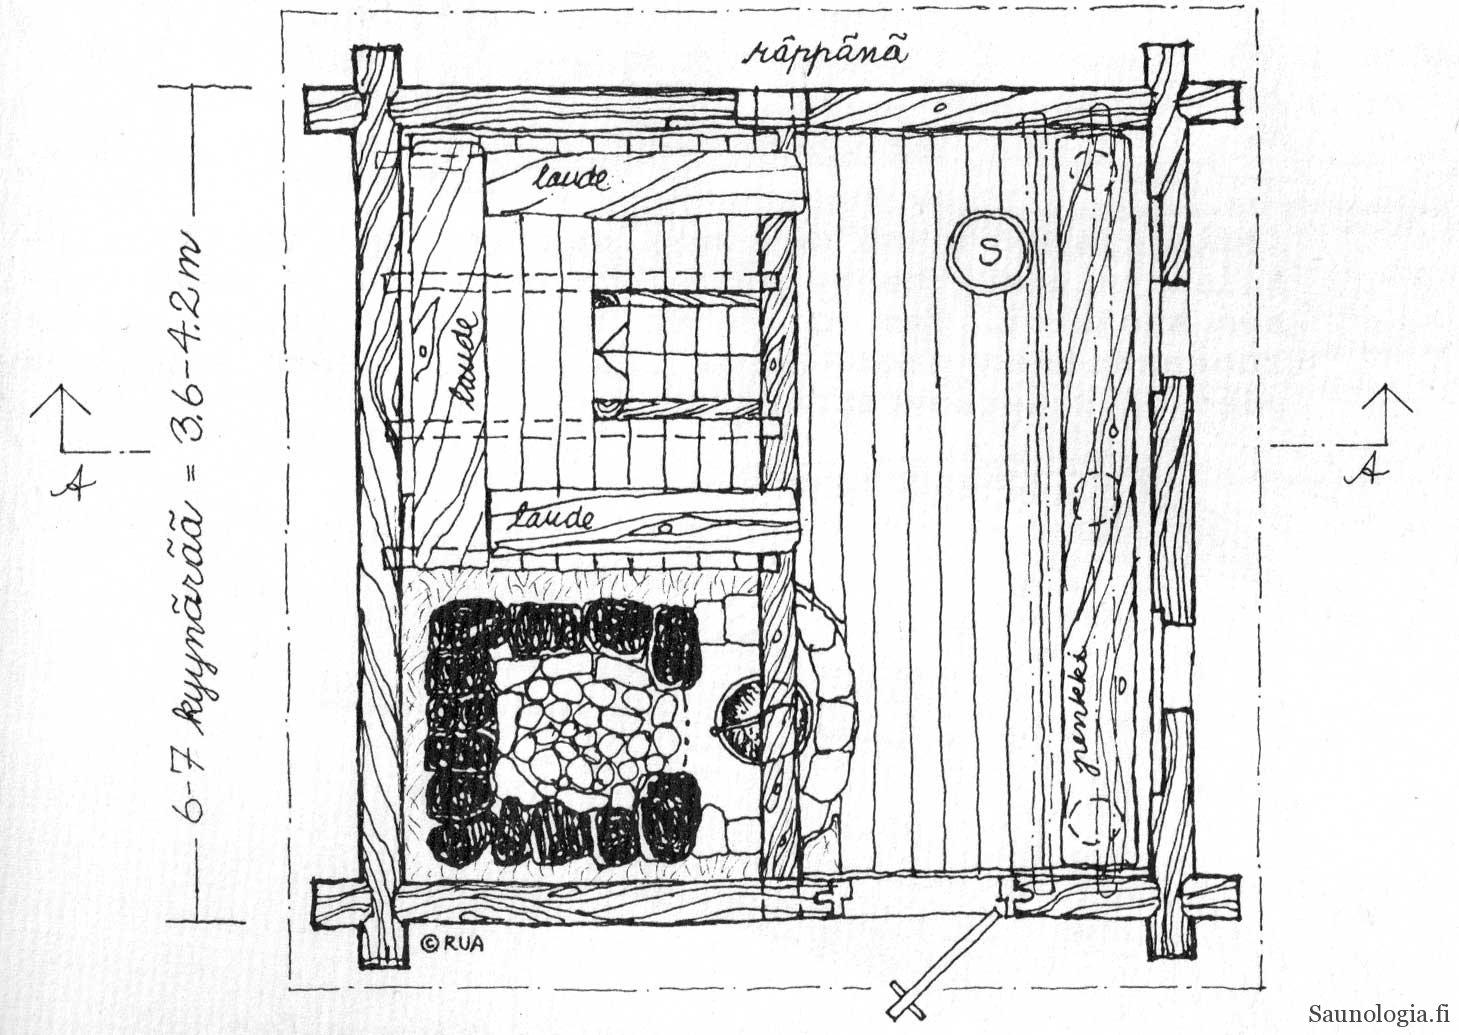 Keski-Suomen sauna